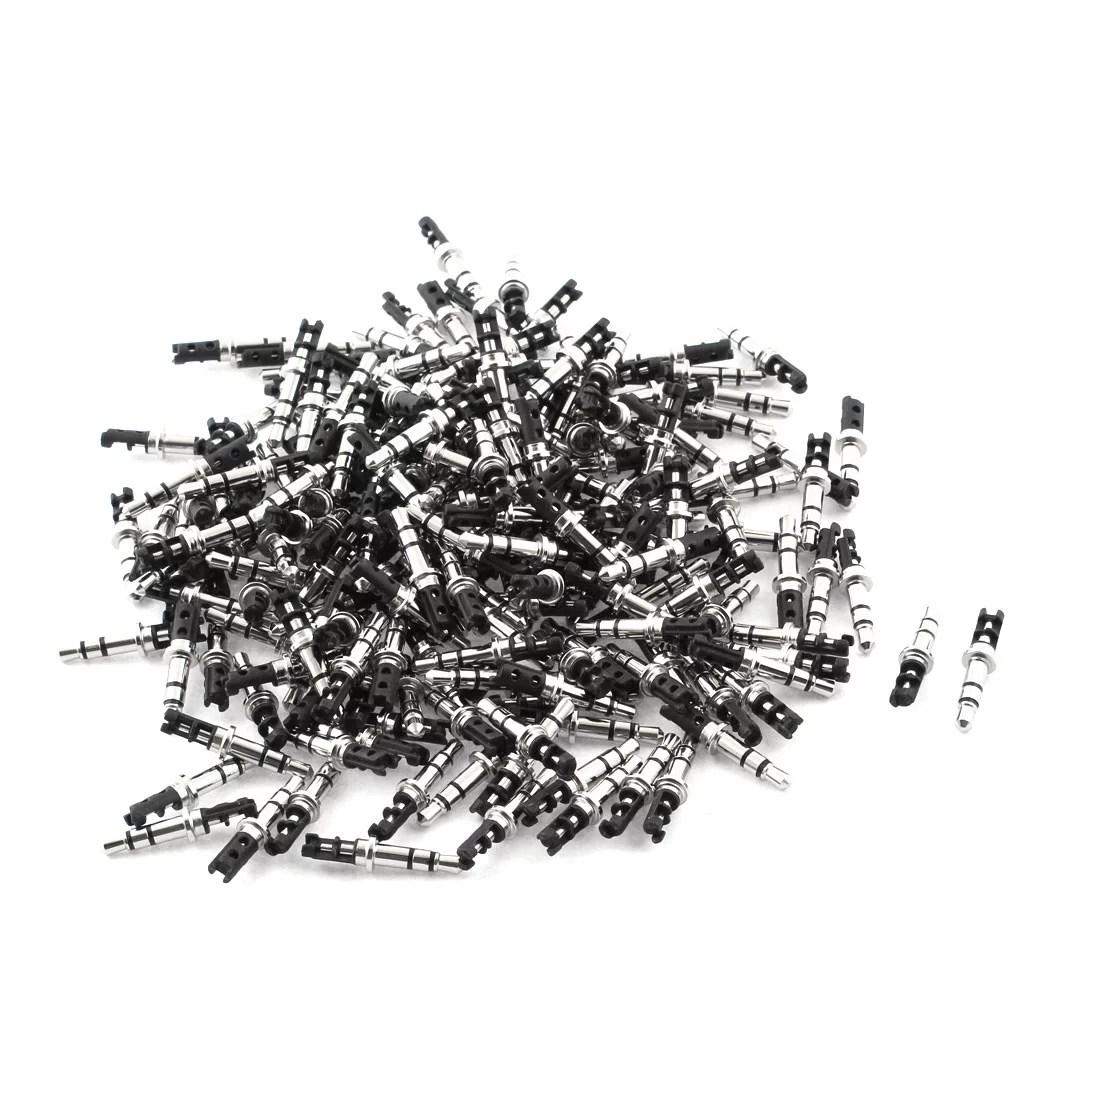 hight resolution of unique bargains 3 5mm stereo male plug repair audio headphone jack solder connector black 200pcs walmart canada